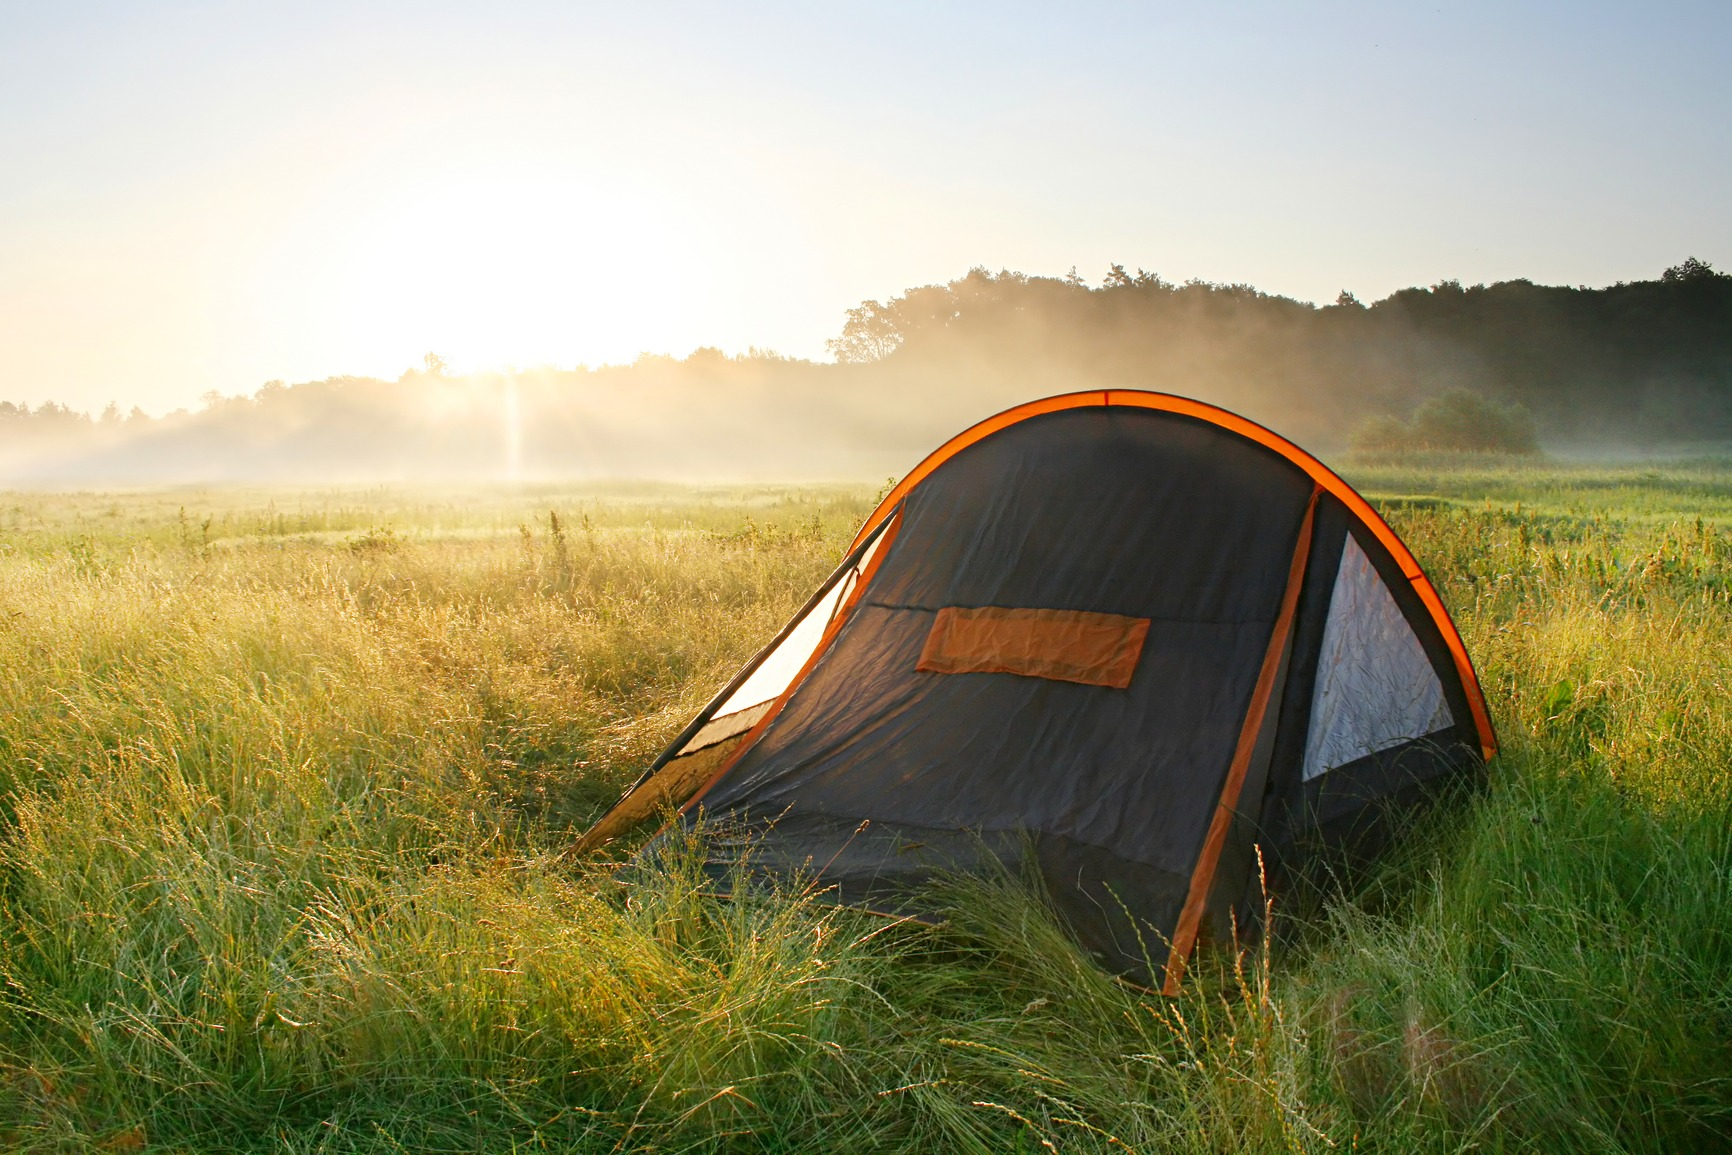 photodune-576217-tent-m